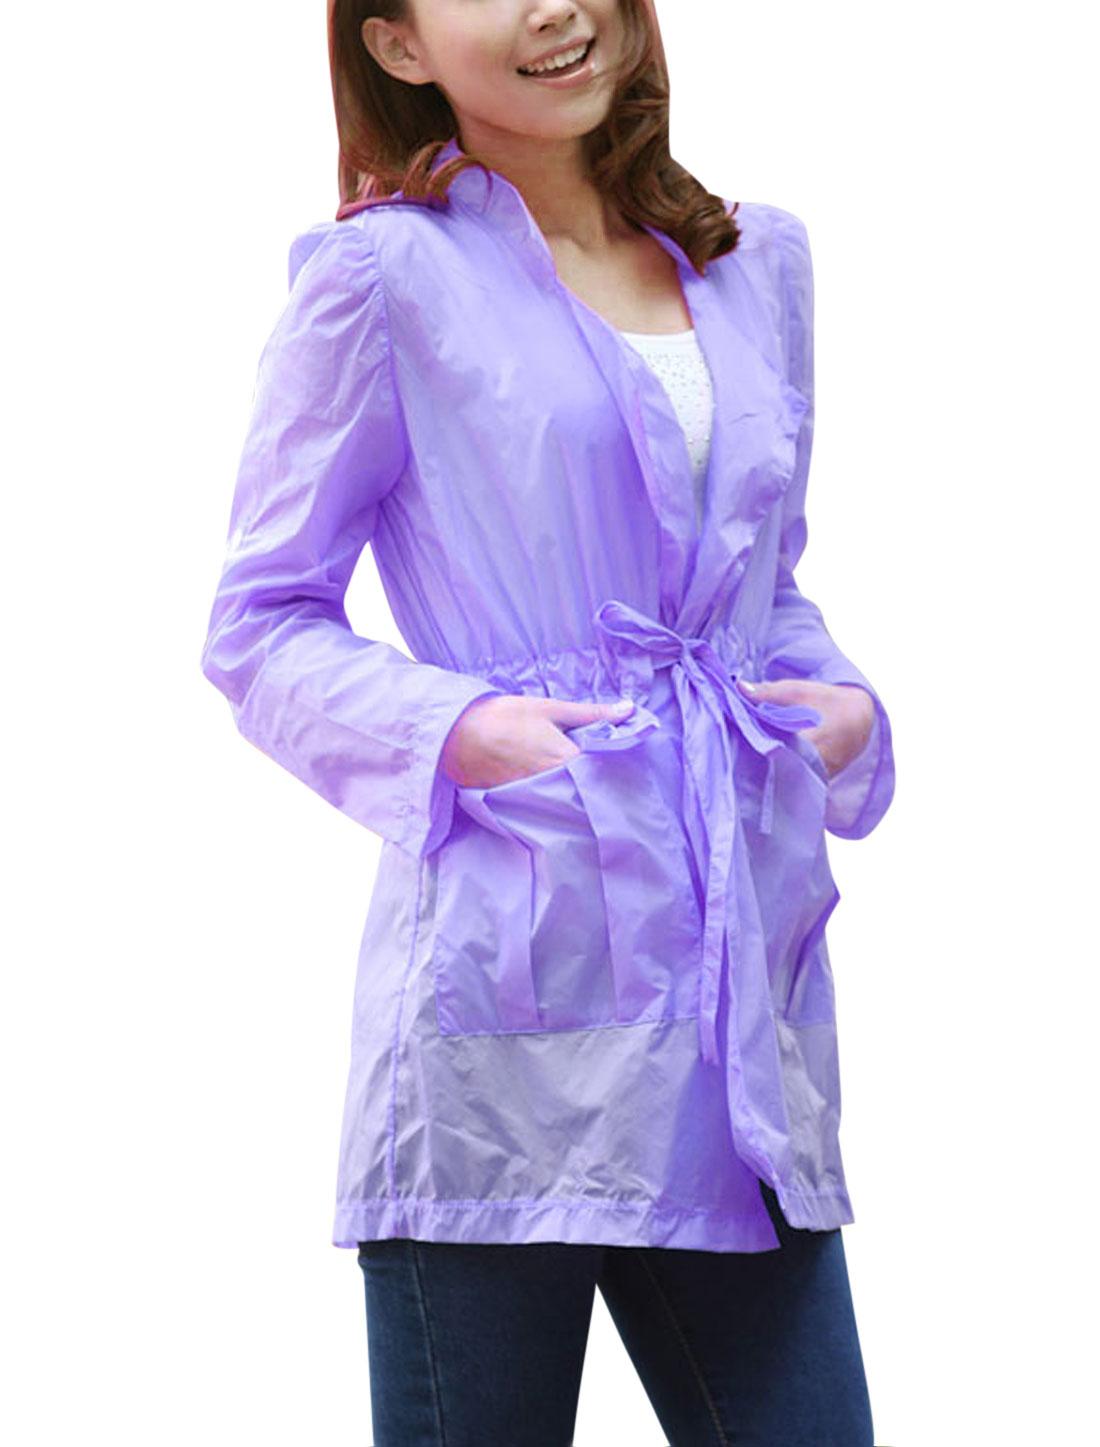 Lady Convertible Collar Drawstring Waist Thin Jacket Lavender XS